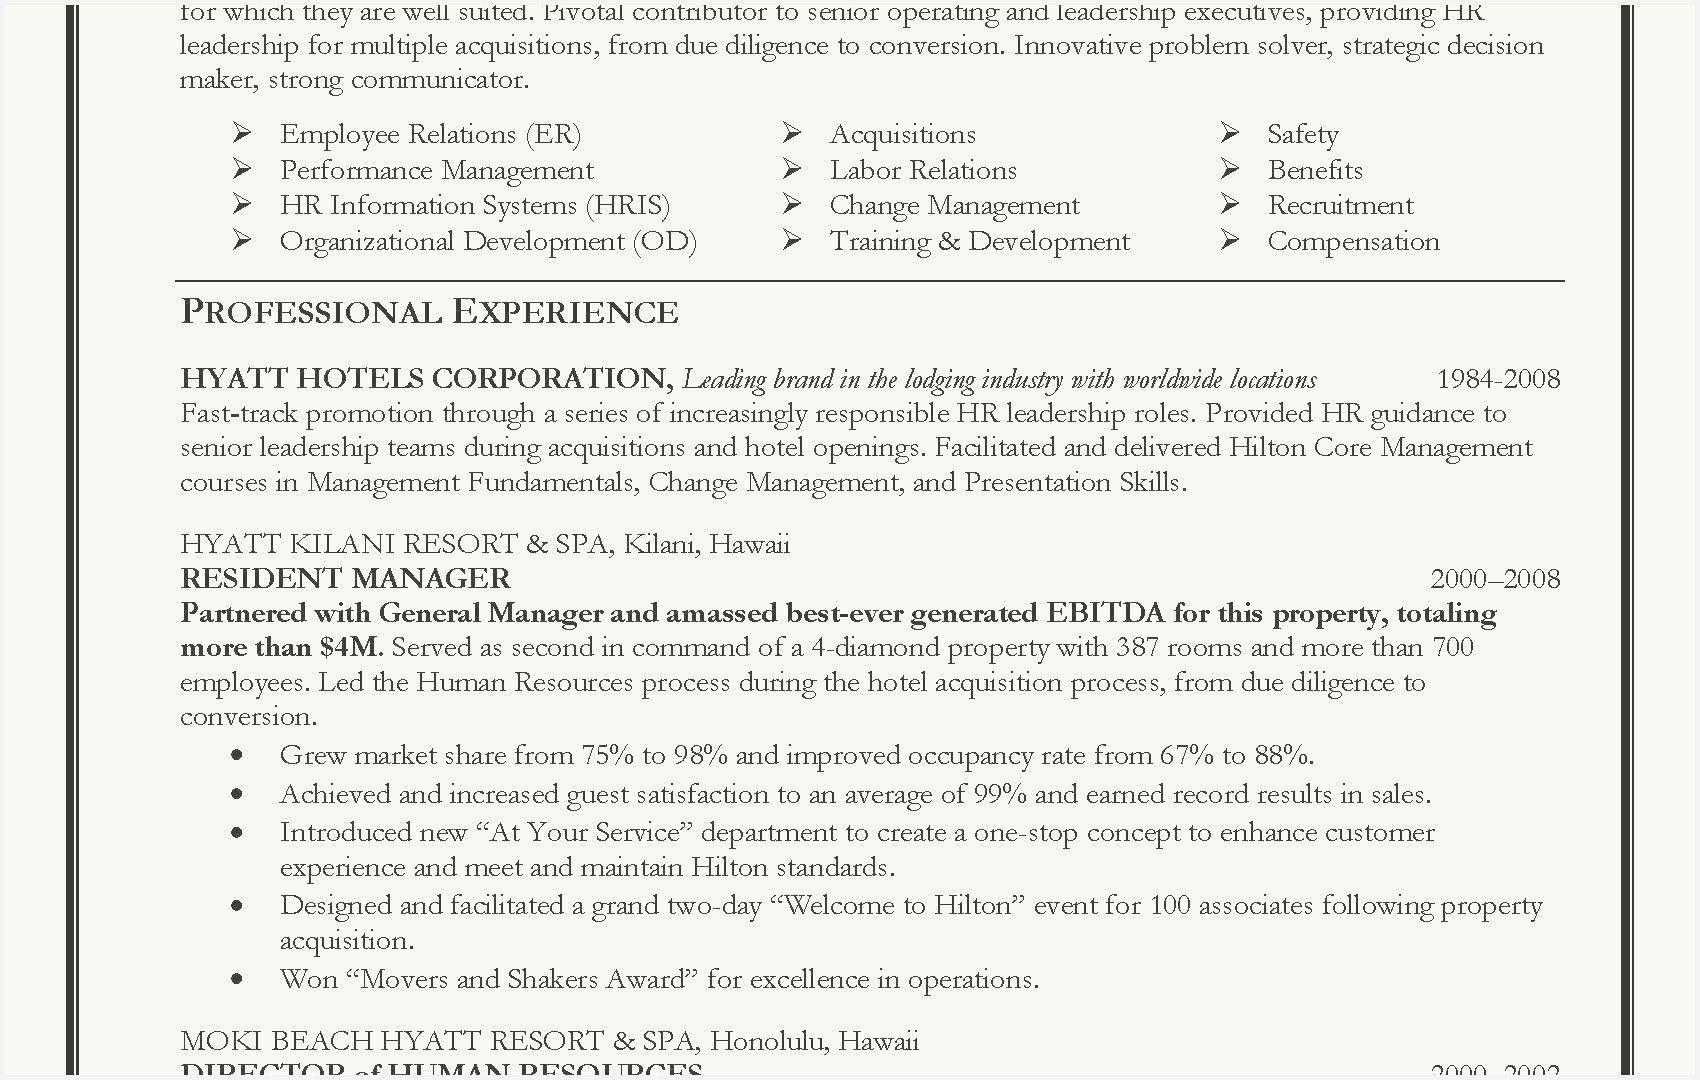 51 inspirational human resources generalist resume pics in